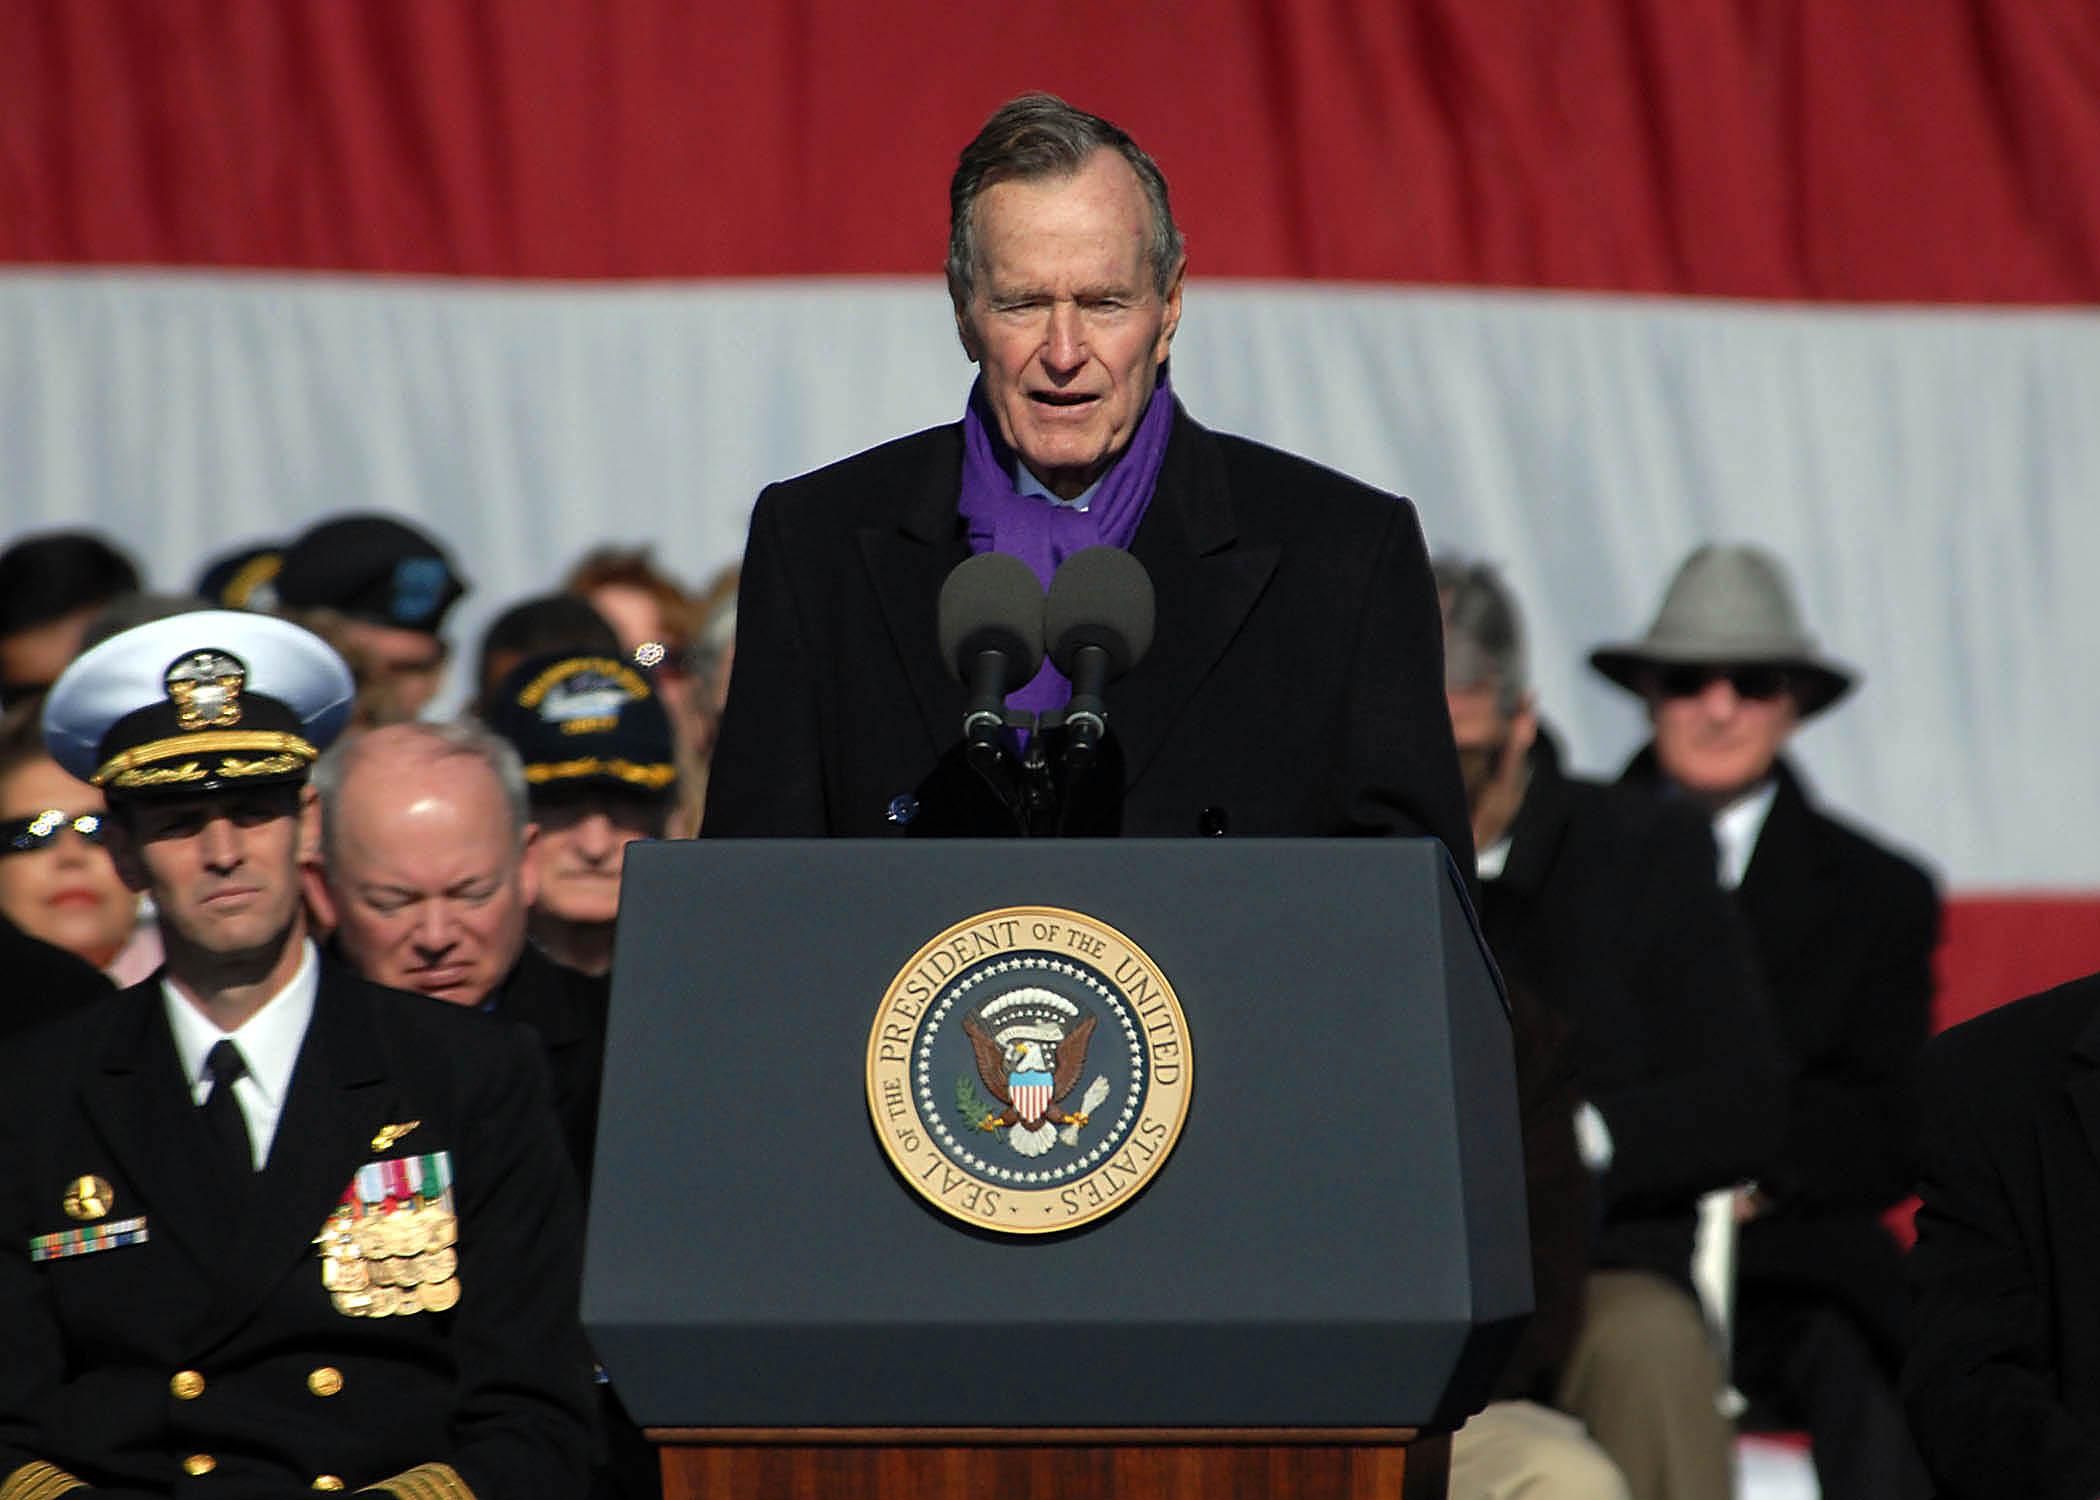 Former President George W. Bush's Image Ratings Improve